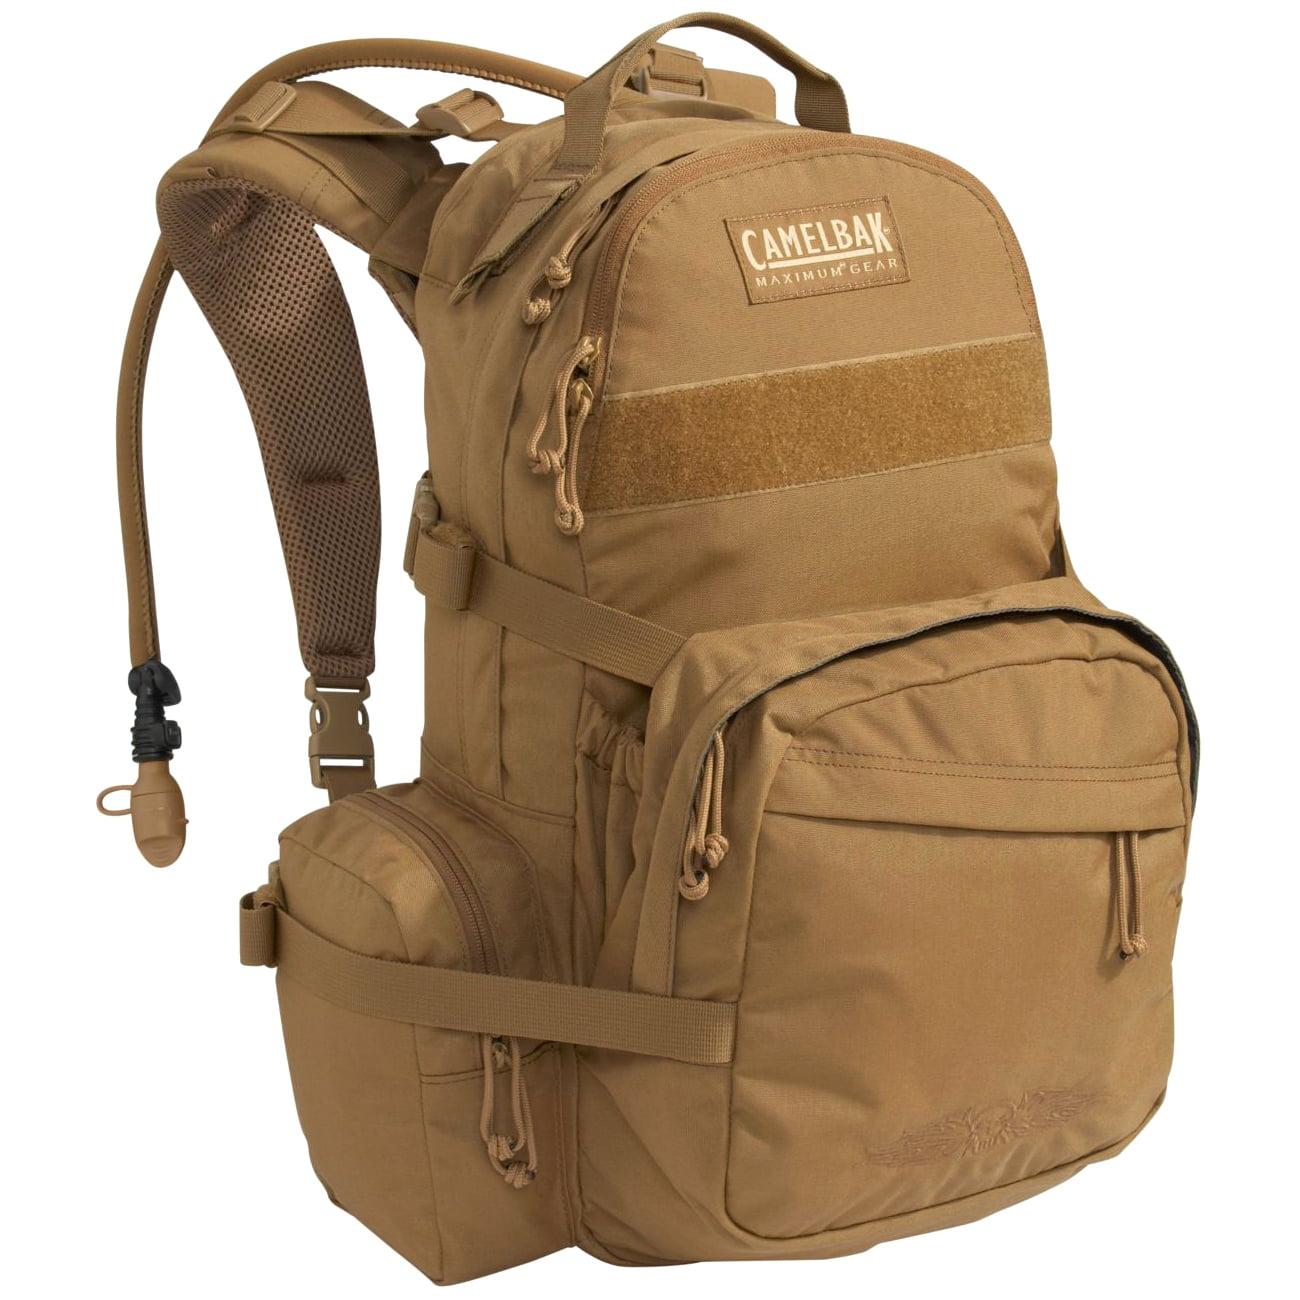 Camelbak Products, LLC Linchpin™ CB 61490